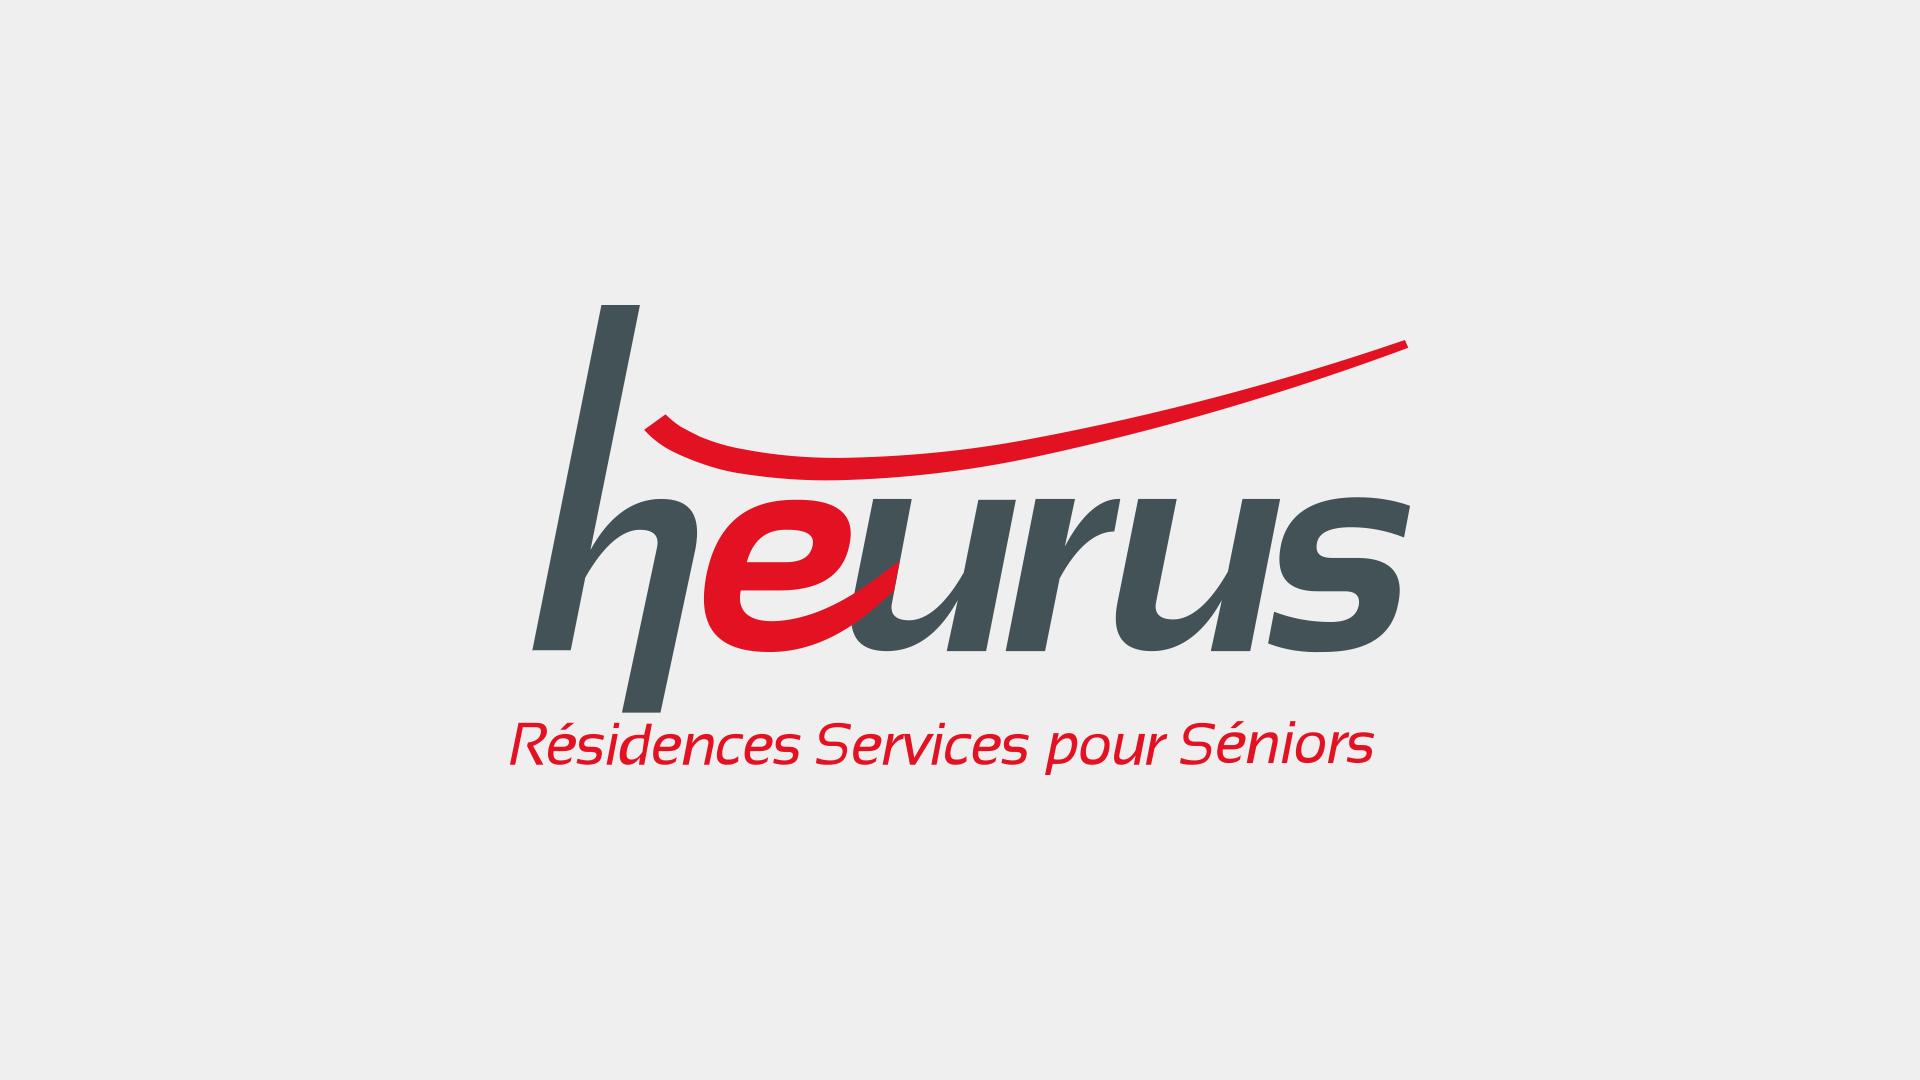 Heurus_1920x1080px